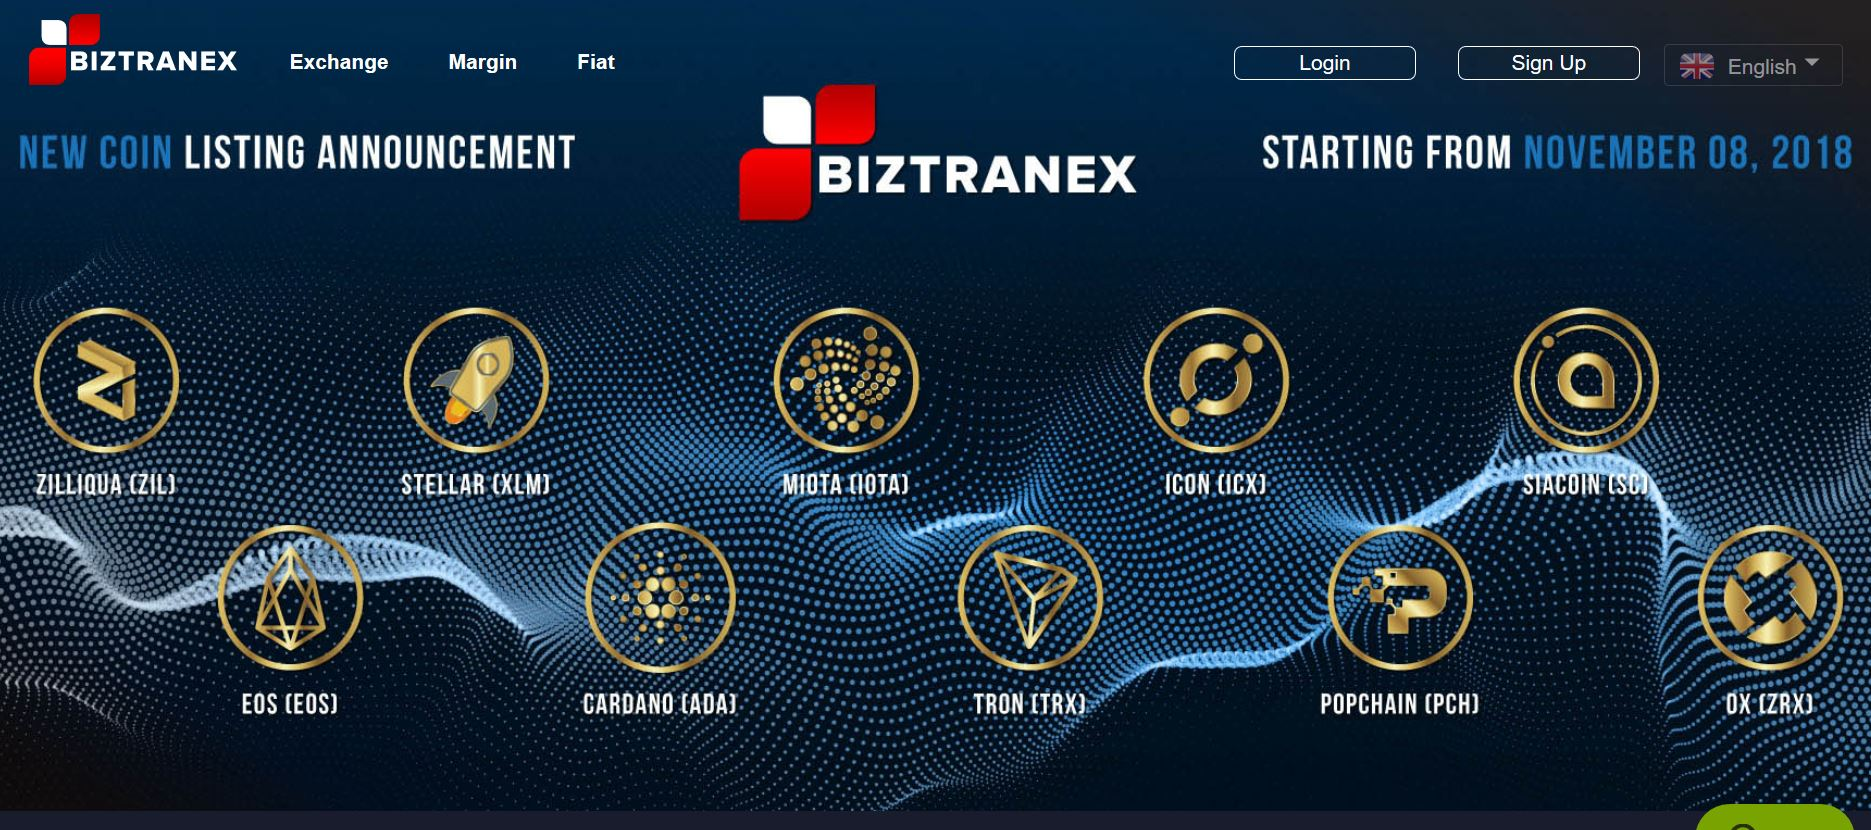 biztranex